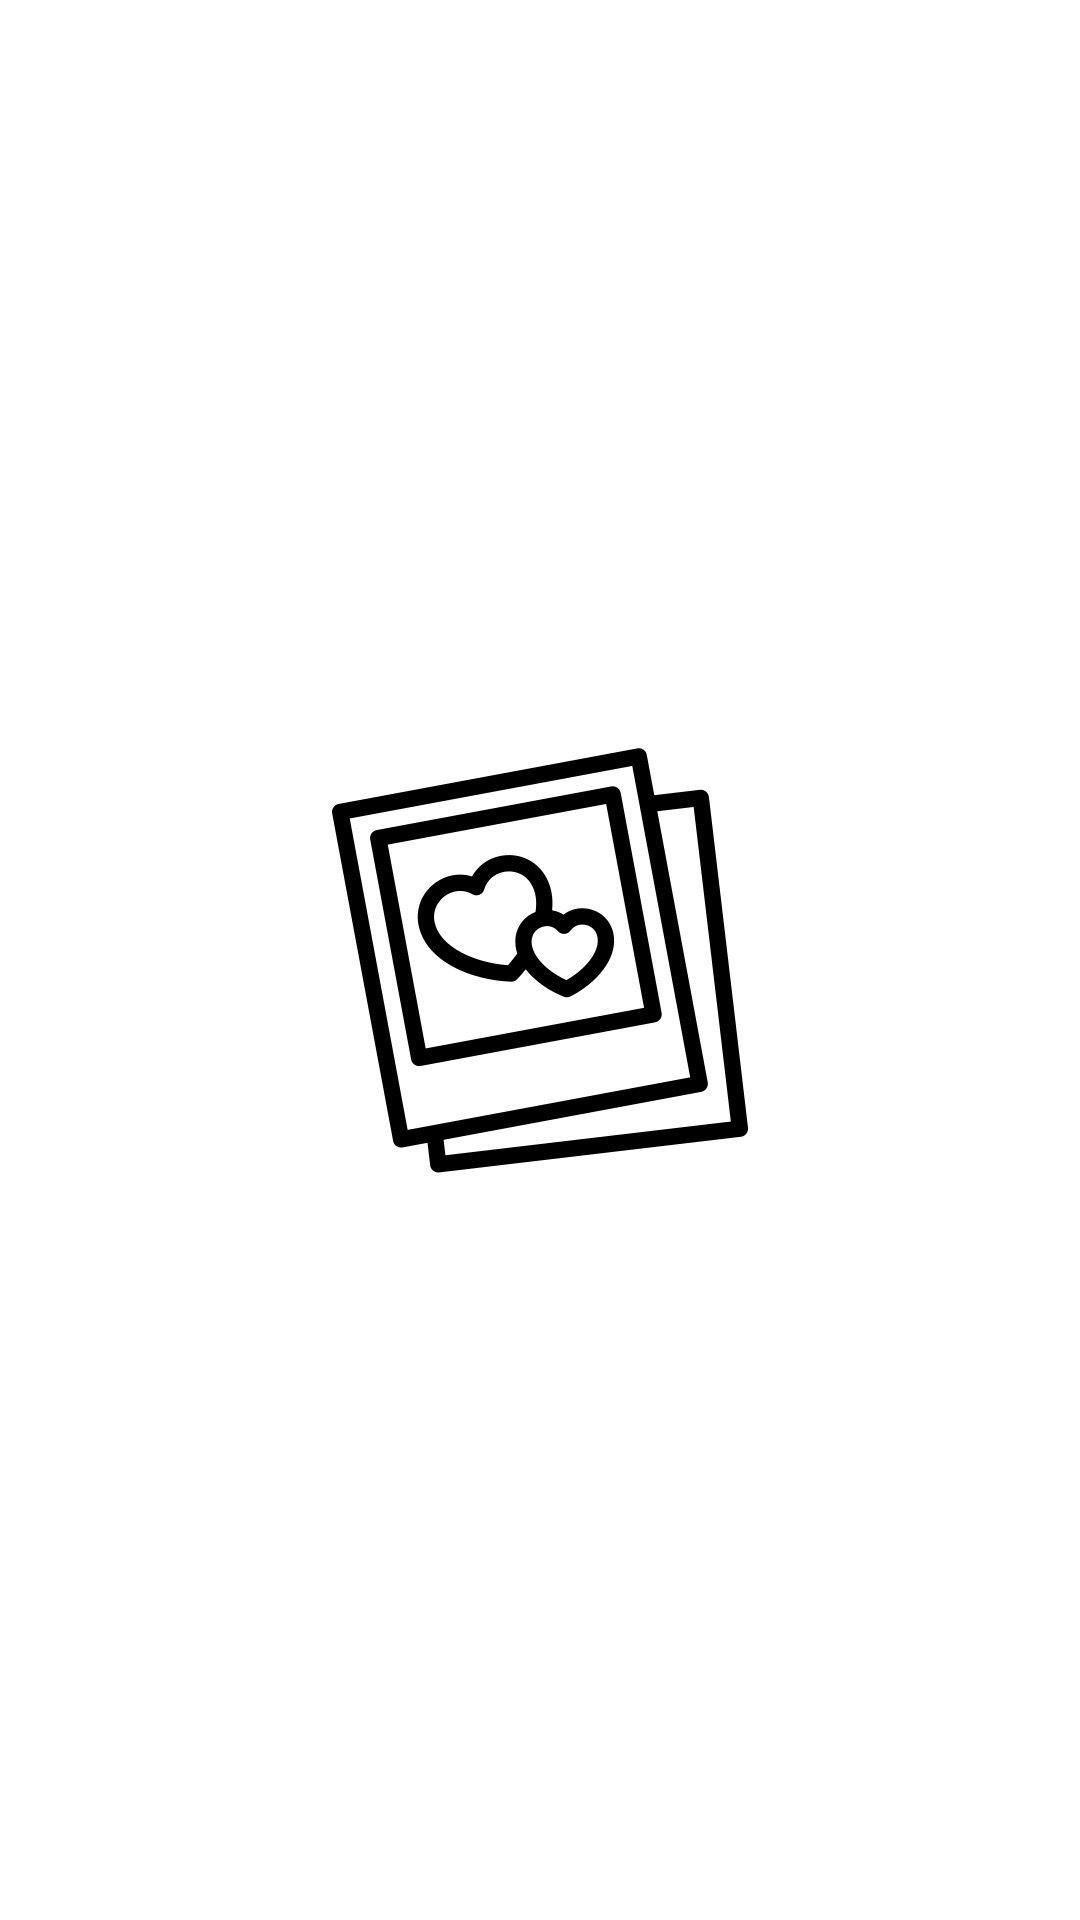 Love Cute Little Drawings Cute Drawings Doodle Drawings Doodle Art Instagram Frame Instagram Whit Logotipo Instagram Ideias Instagram Imagens De Instagram